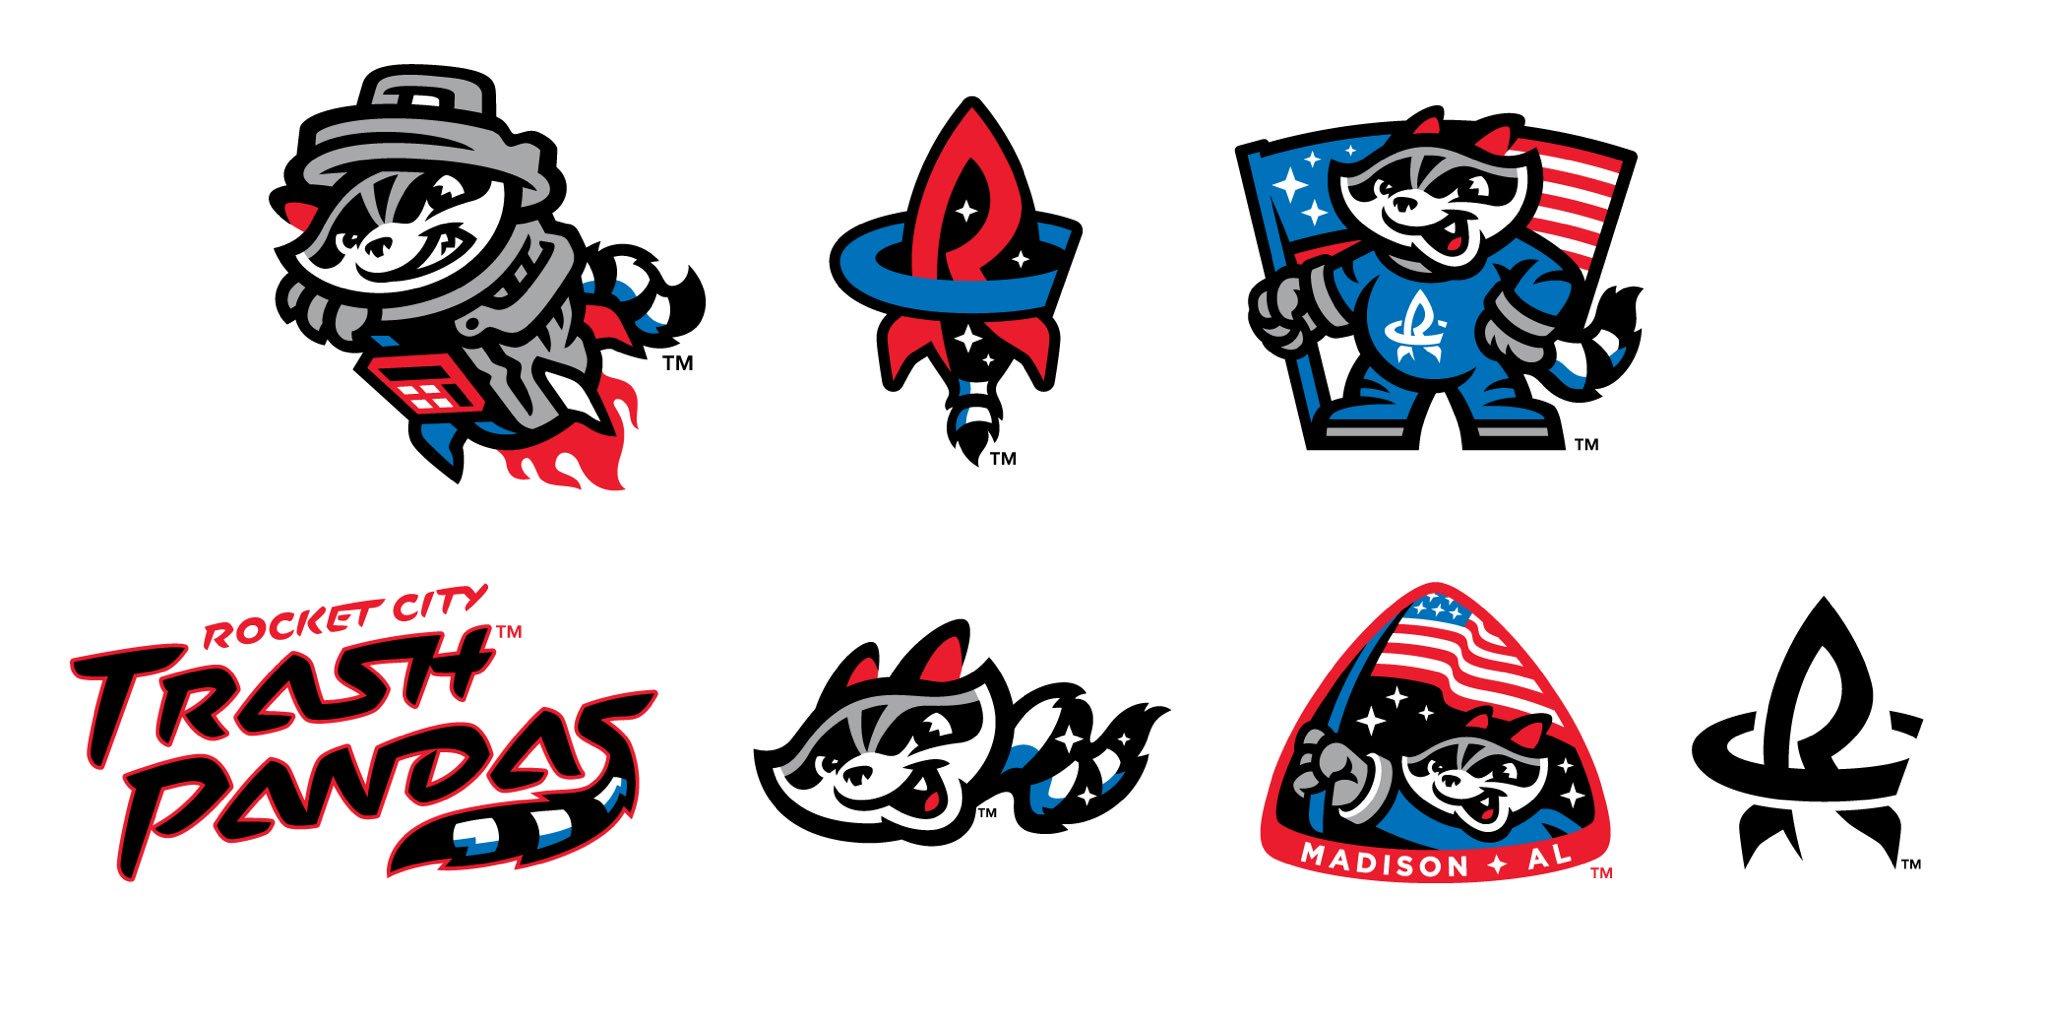 Rocket City Trash Pandas Unveil Logos Sportslogos Net News